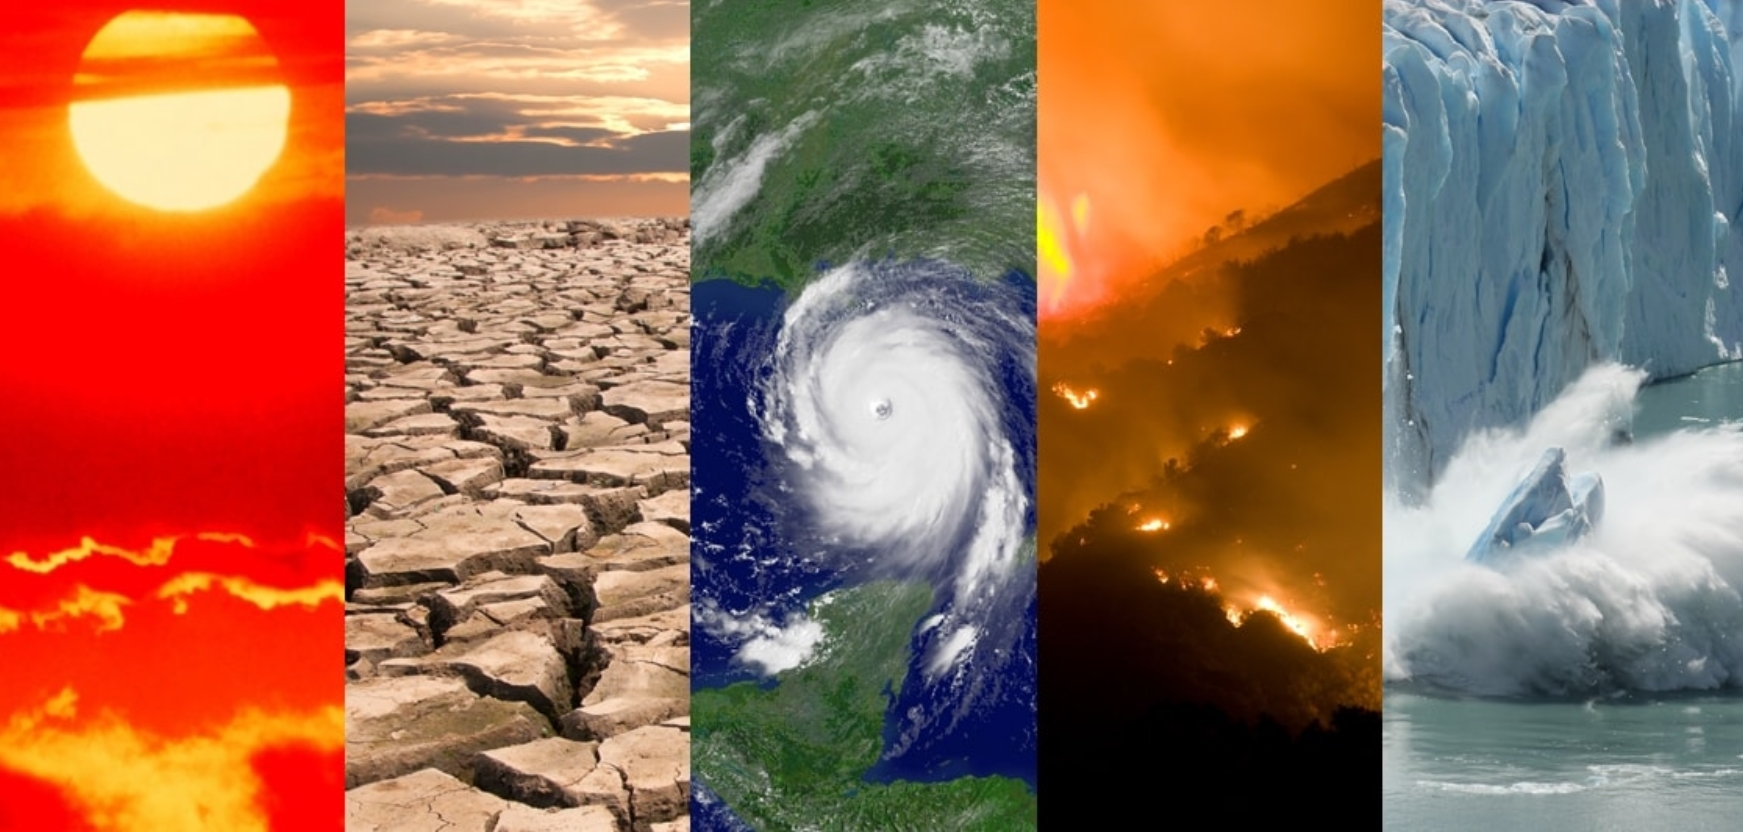 Record Heat, Wildfires and Smoke Choke Western USA – Freakish Denver Snow – 70s Return Next Week